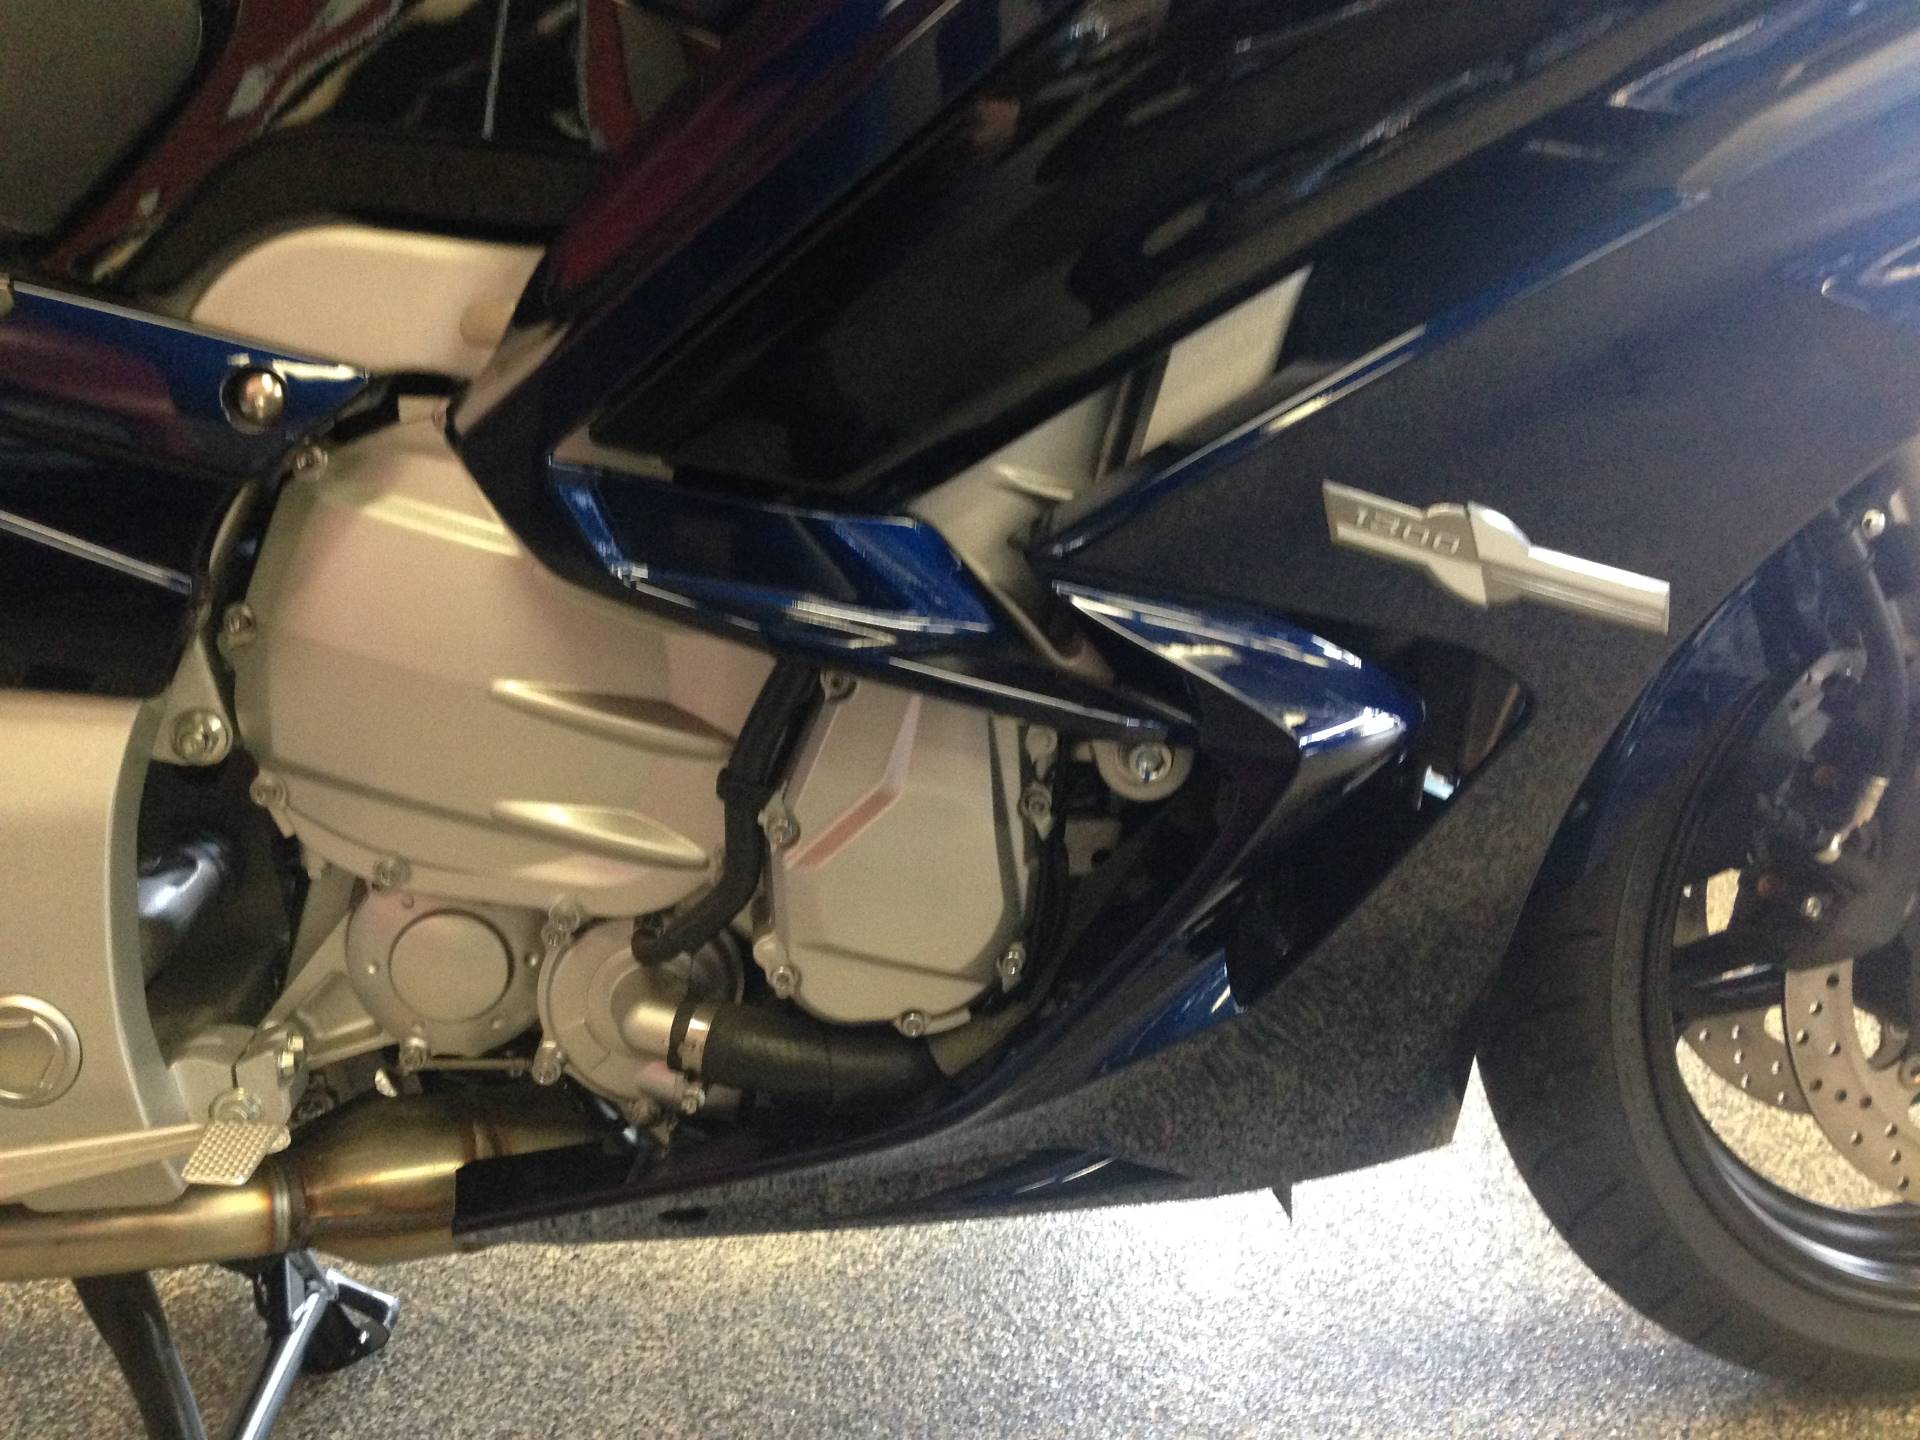 2016 Yamaha FJR1300A 12